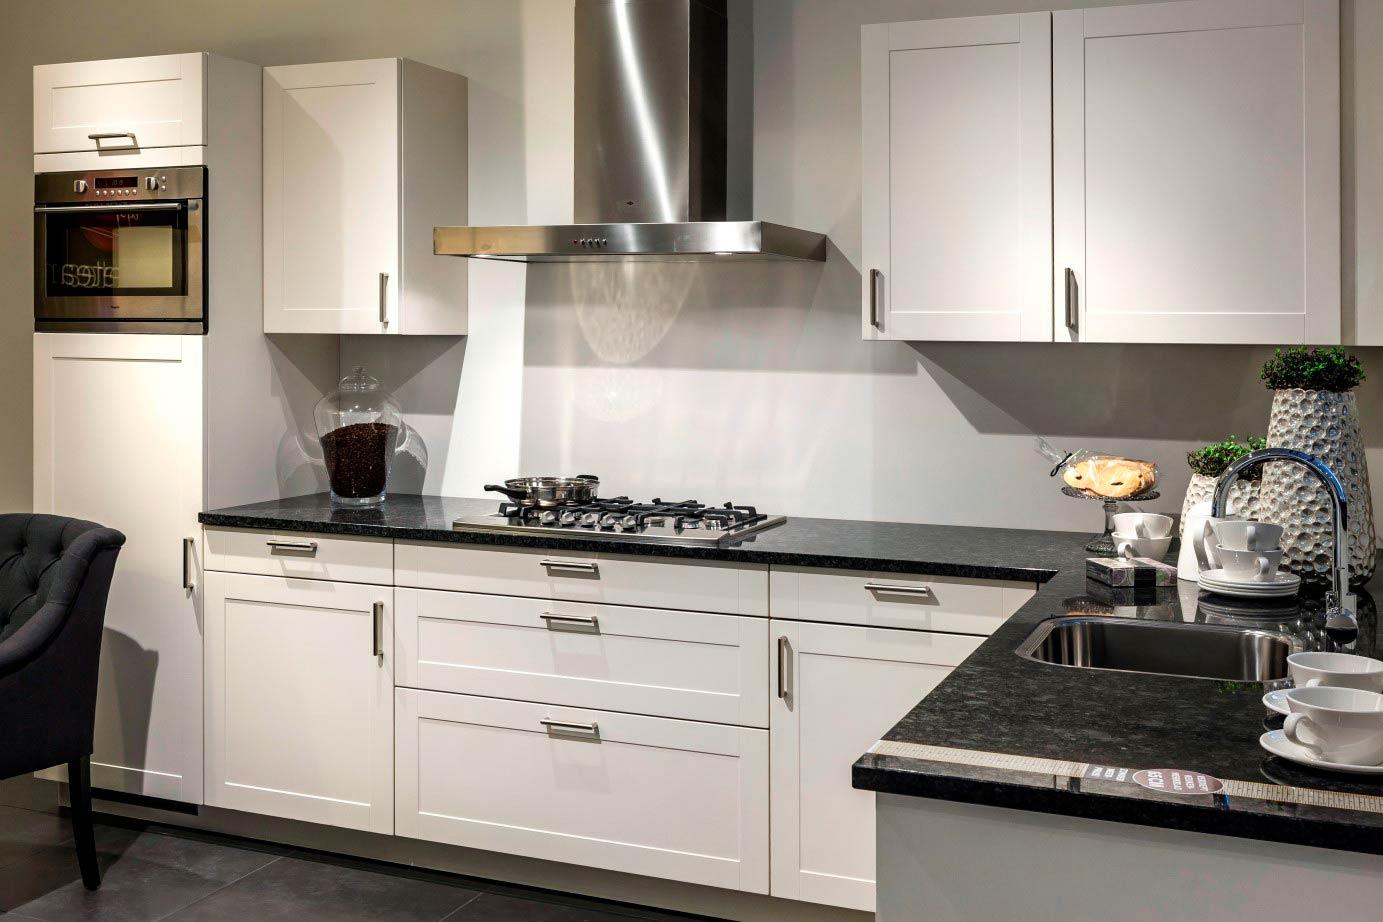 Moderne L Keuken : Keukenopstelling bekijk de mogelijkheden en kies db keukens